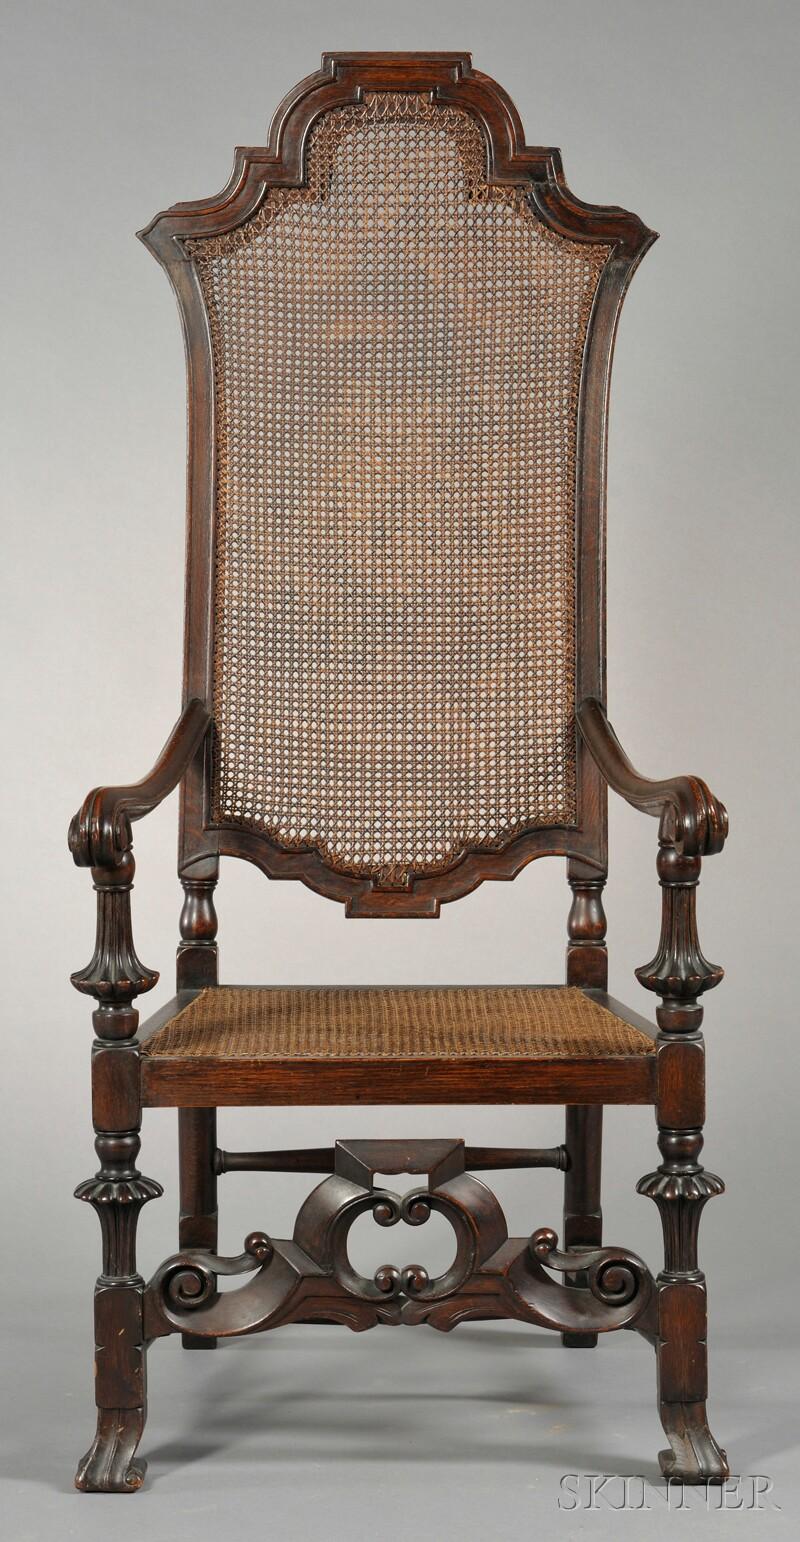 Baroque-style High-back Armchair